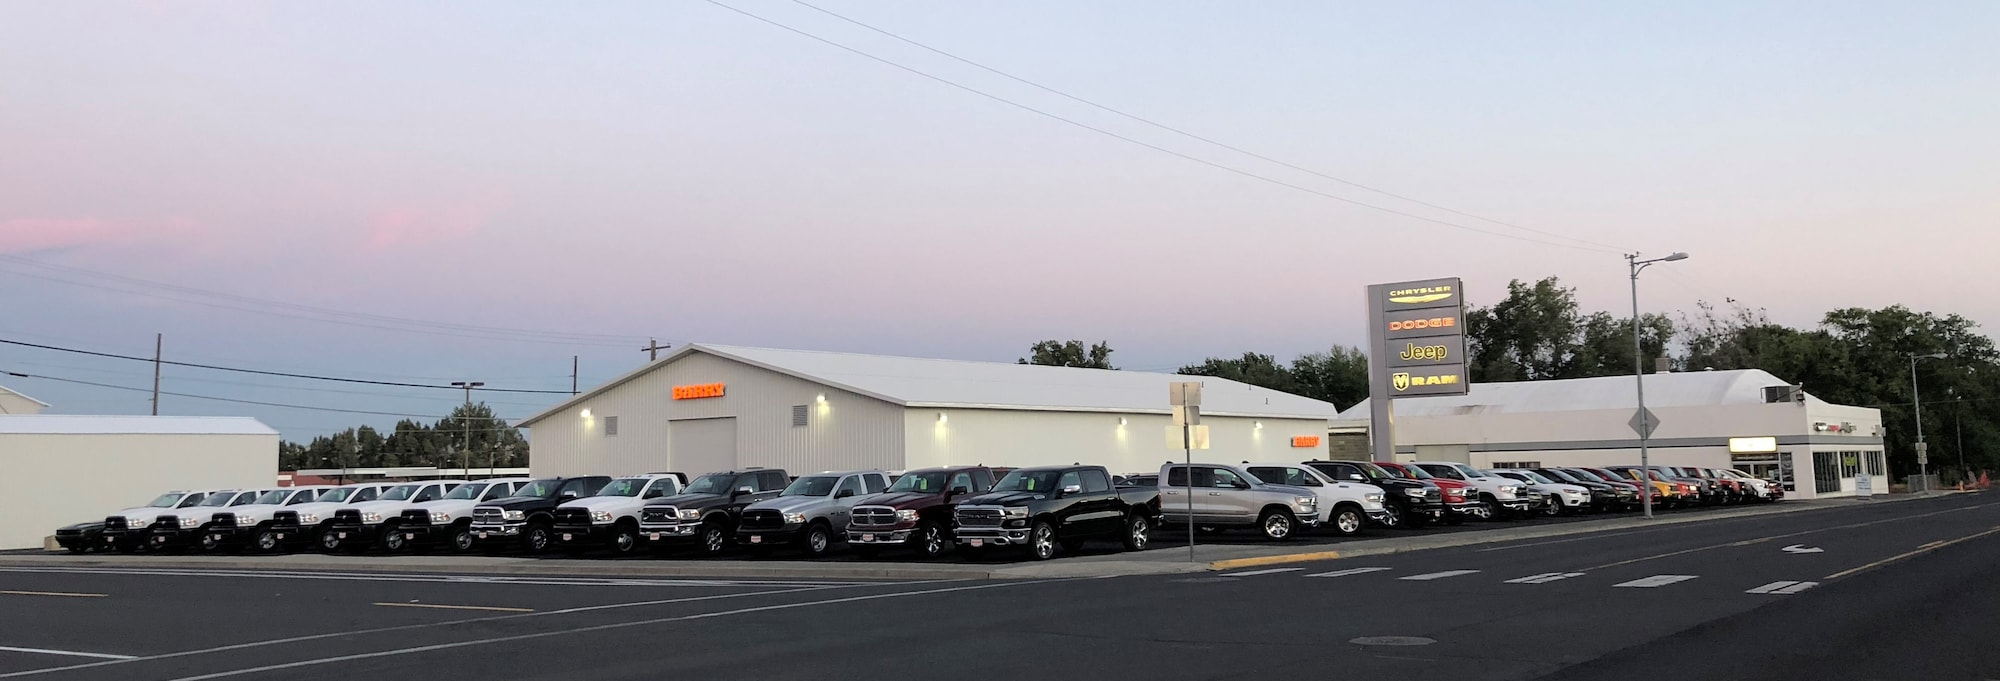 Ephrata Car Dealership - Barry Chrysler Jeep Dodge